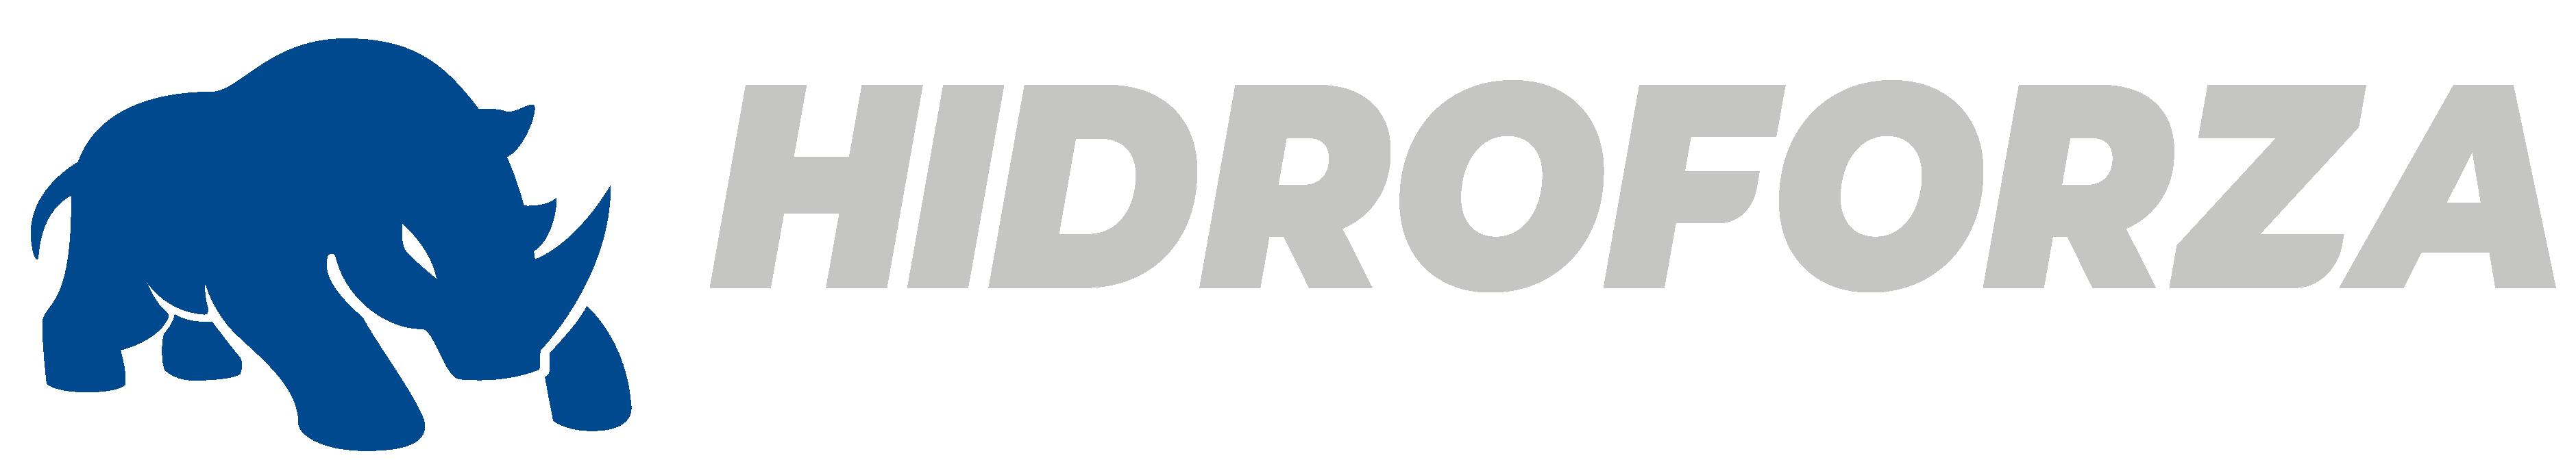 HIDROFORZA